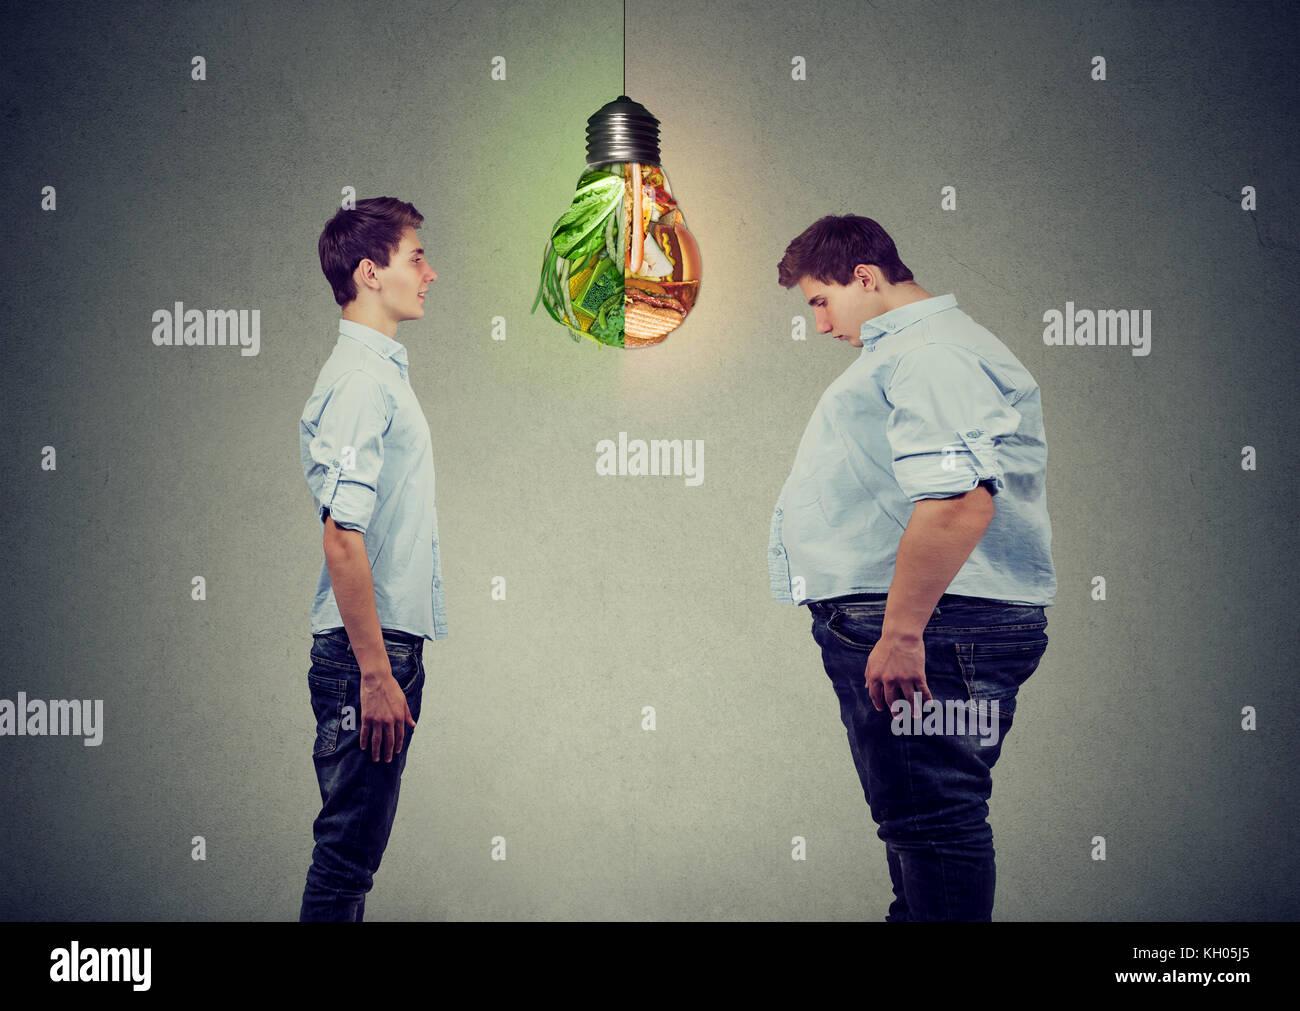 Fat Man Big Belly Diet Stock Photos Amp Fat Man Big Belly